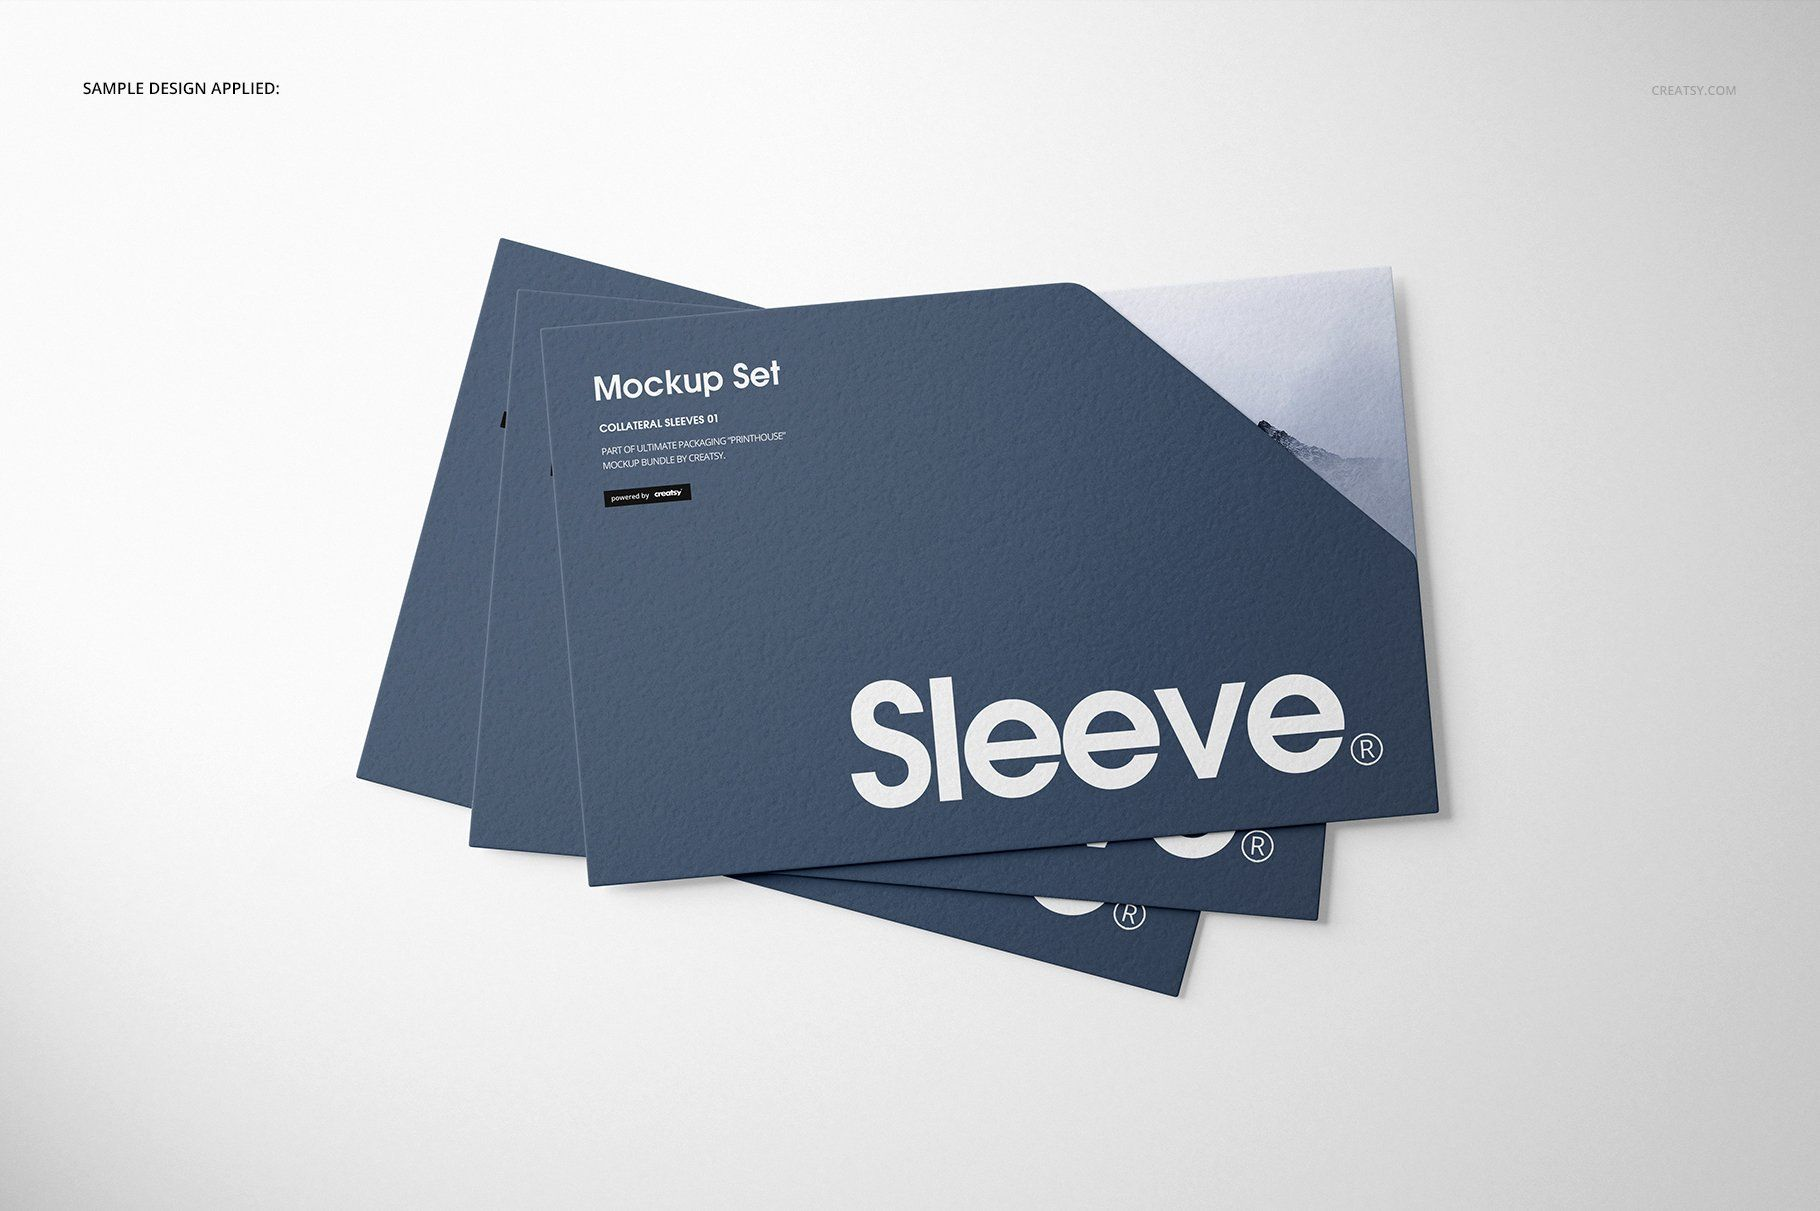 Collateral Sleeves Mockup Set 2 Icon Design Inspiration Graphic Design Studios Mockup